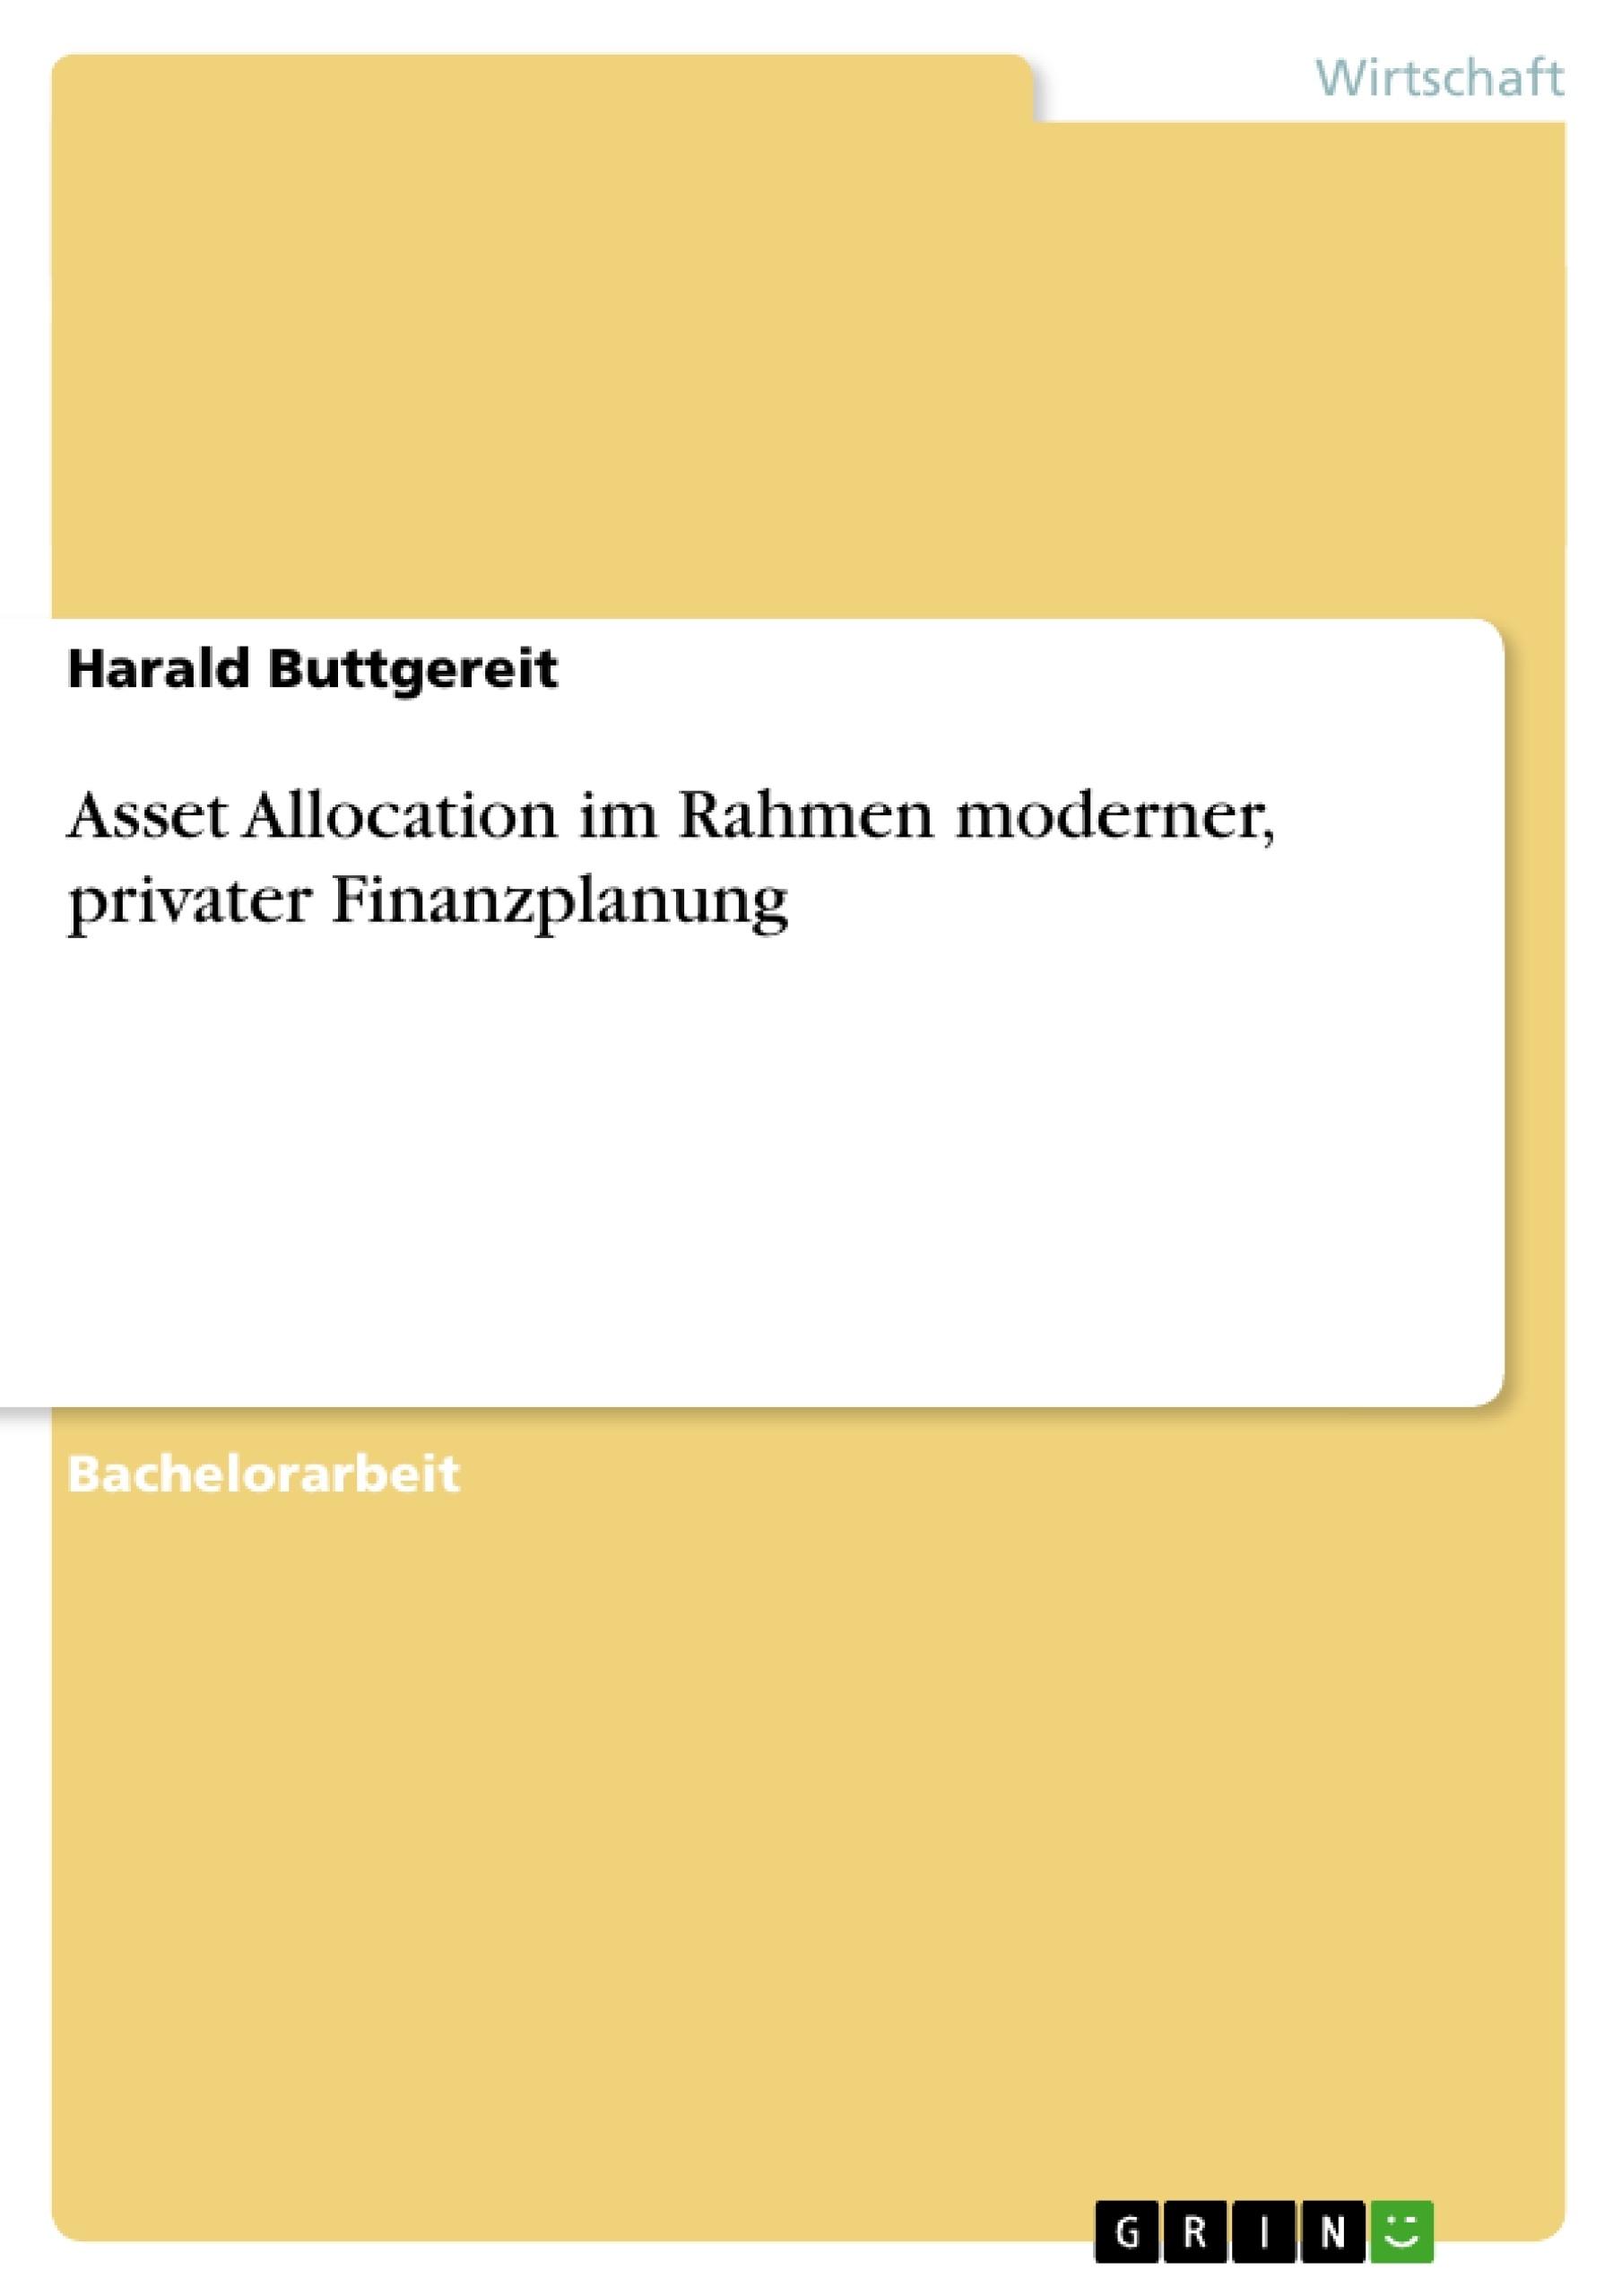 Titel: Asset Allocation im Rahmen moderner, privater Finanzplanung